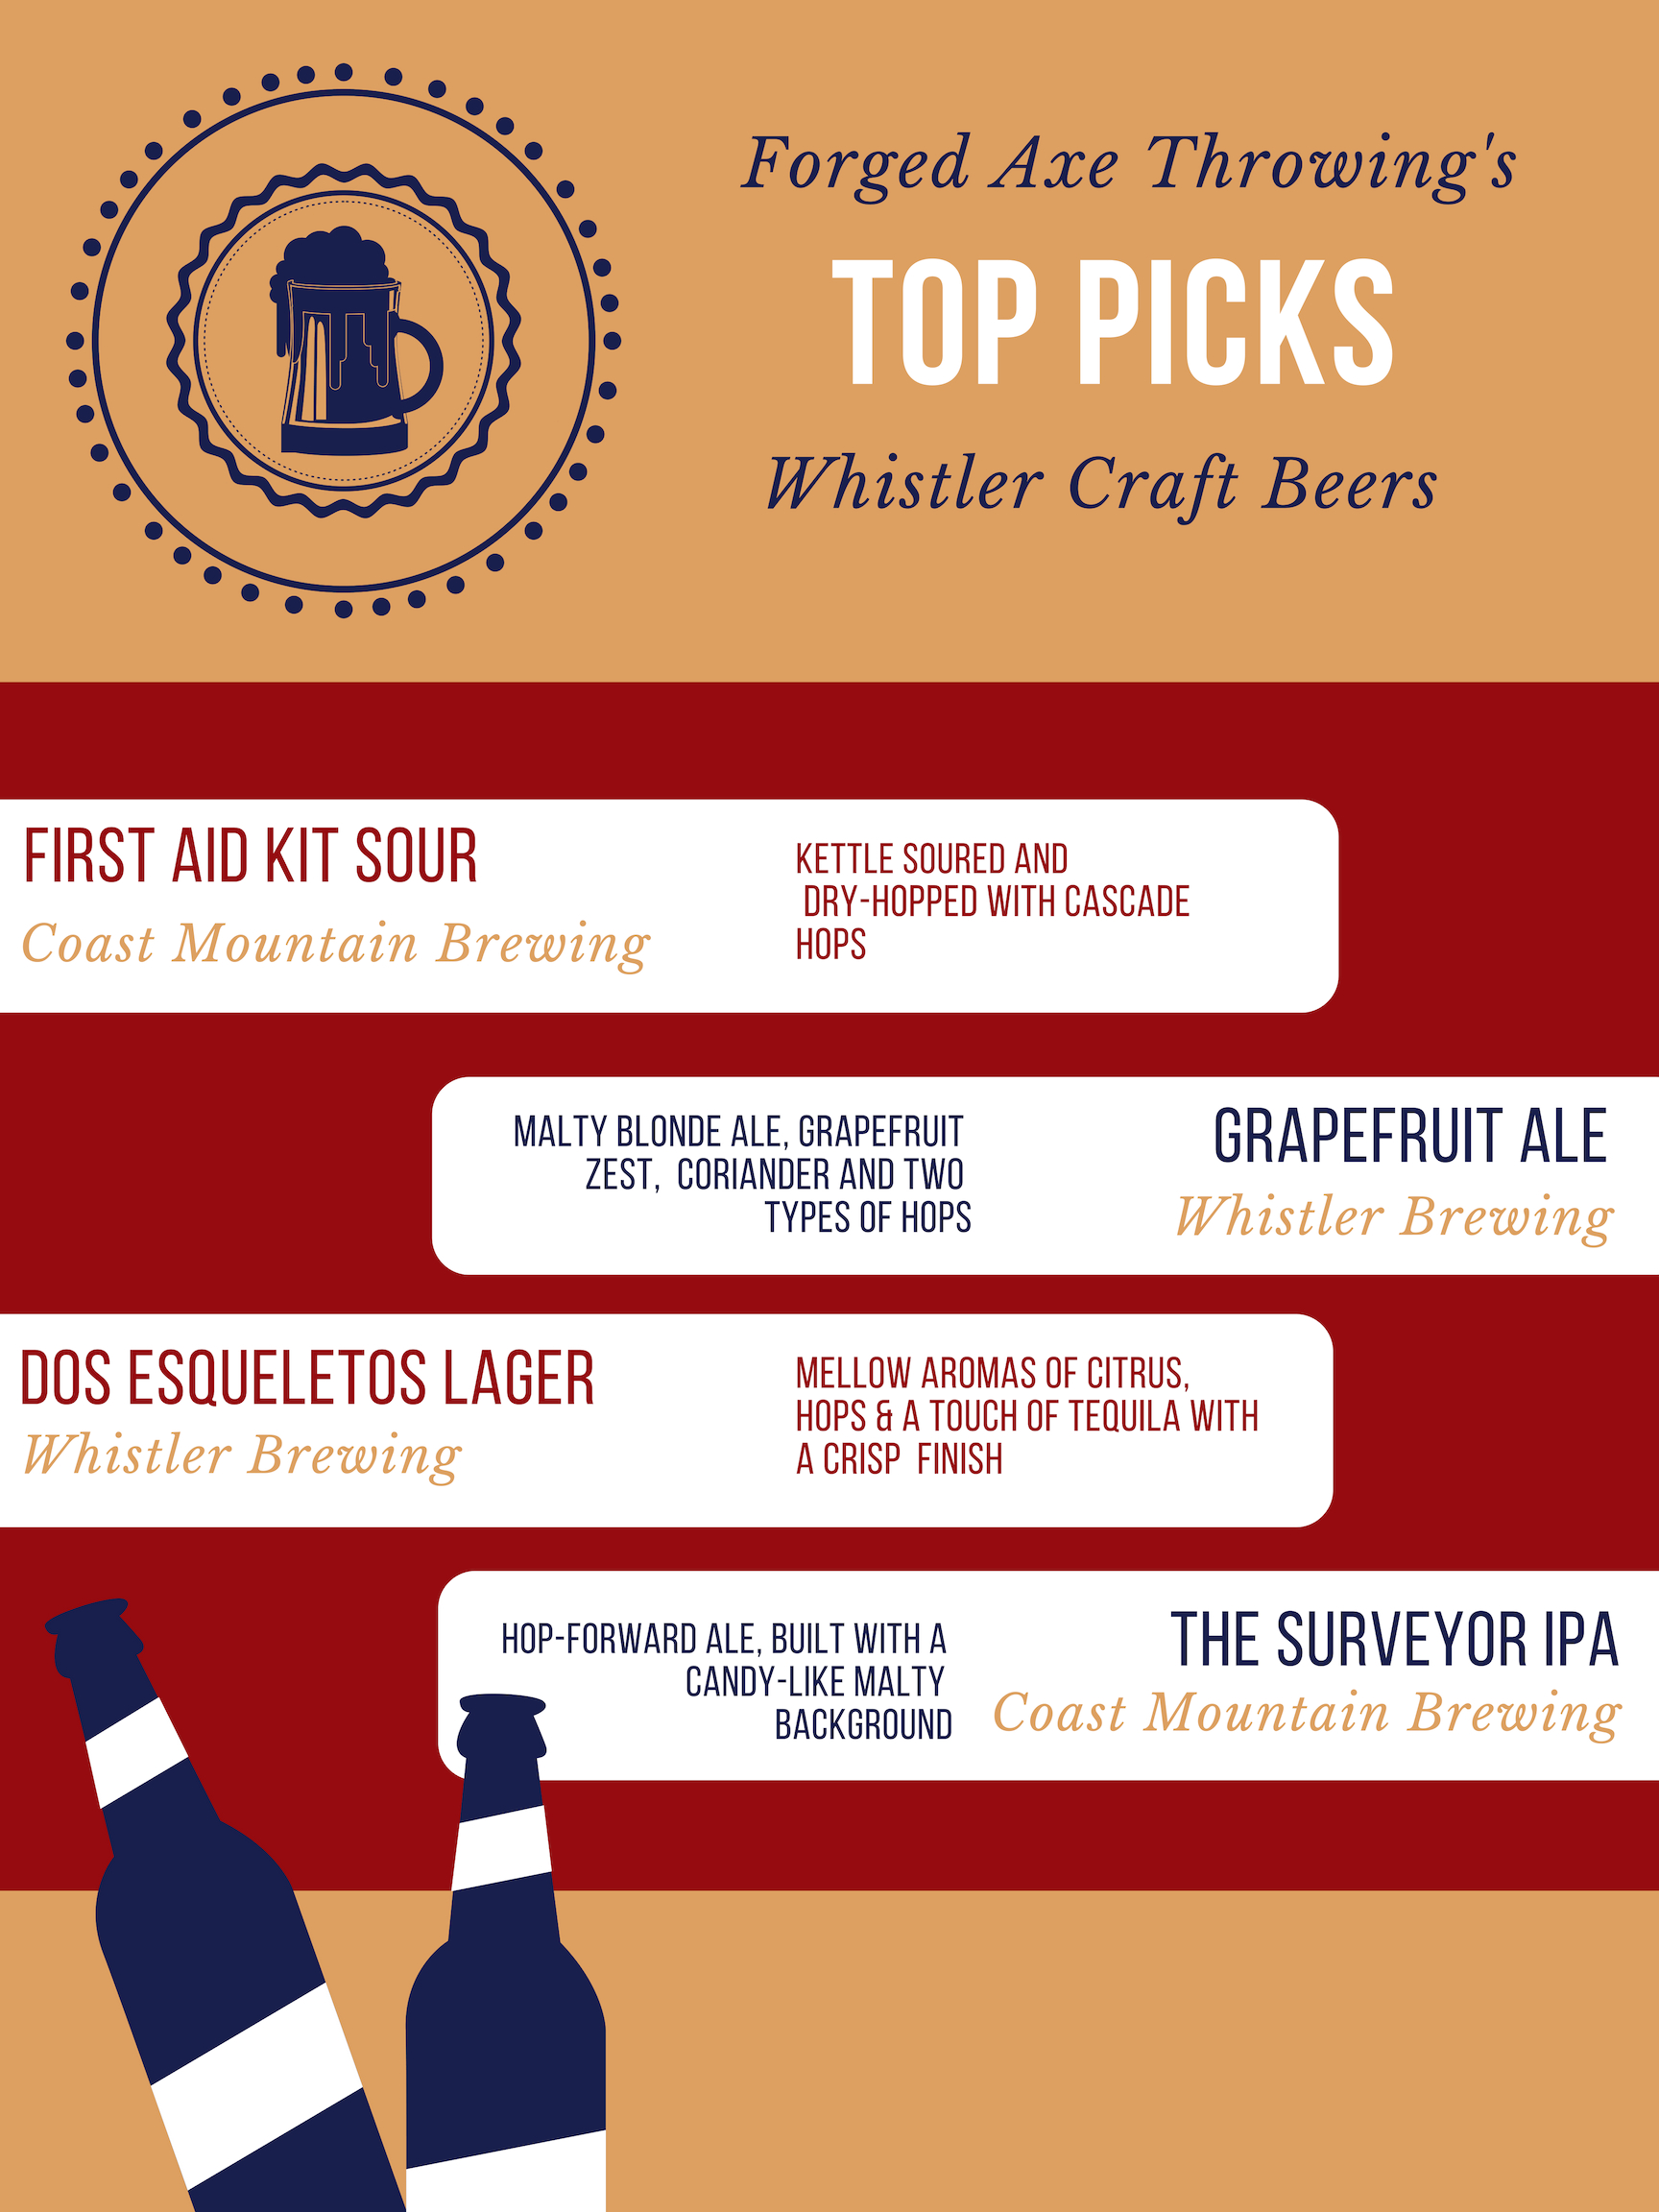 Forged Favorite beers